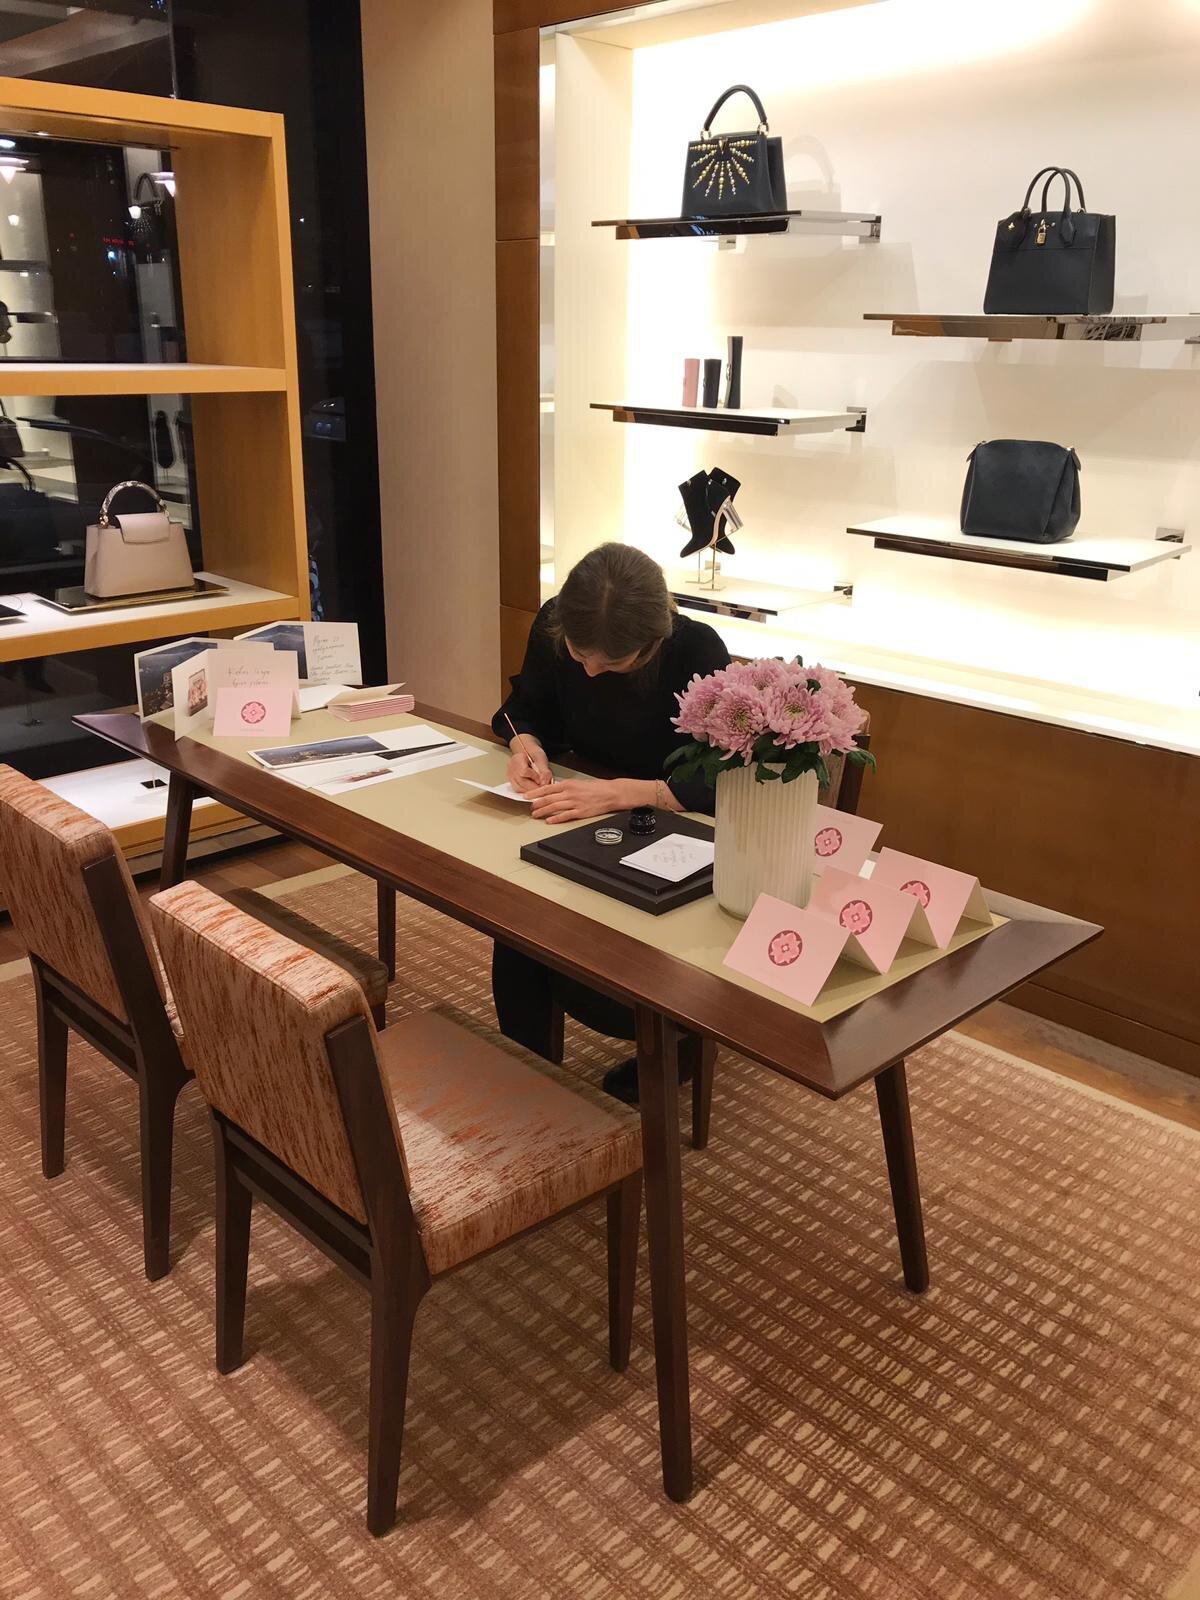 Louis Vuitton store on Valentine's Day 2019